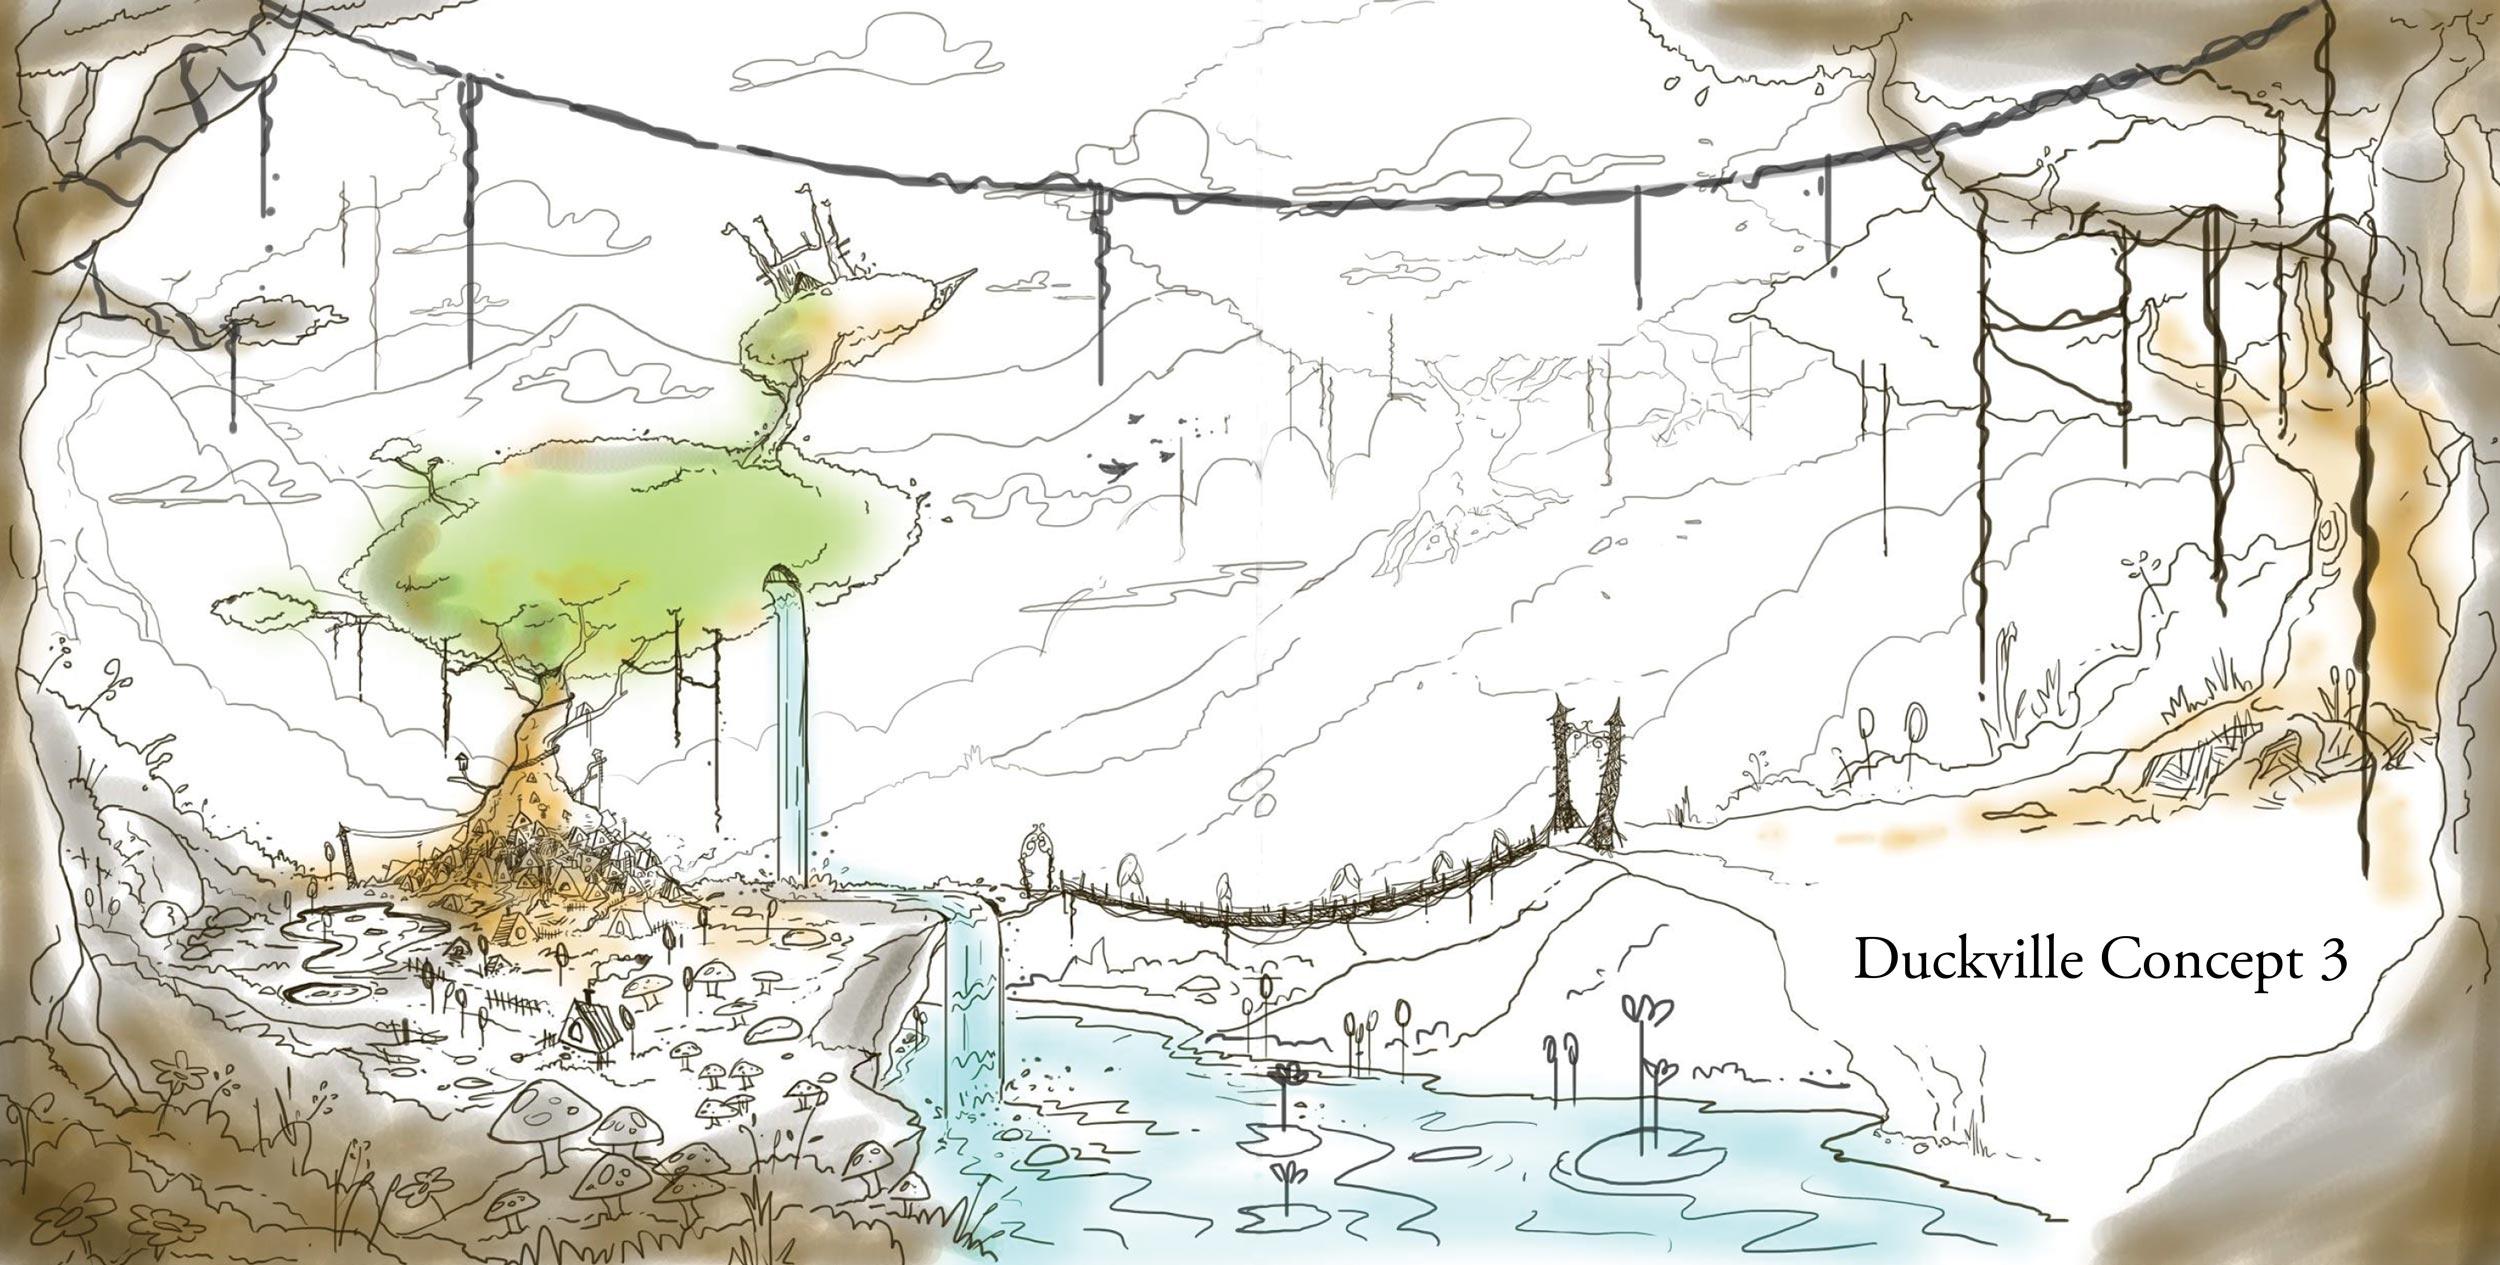 Duckville-Concept-Appendix-3-4.jpg